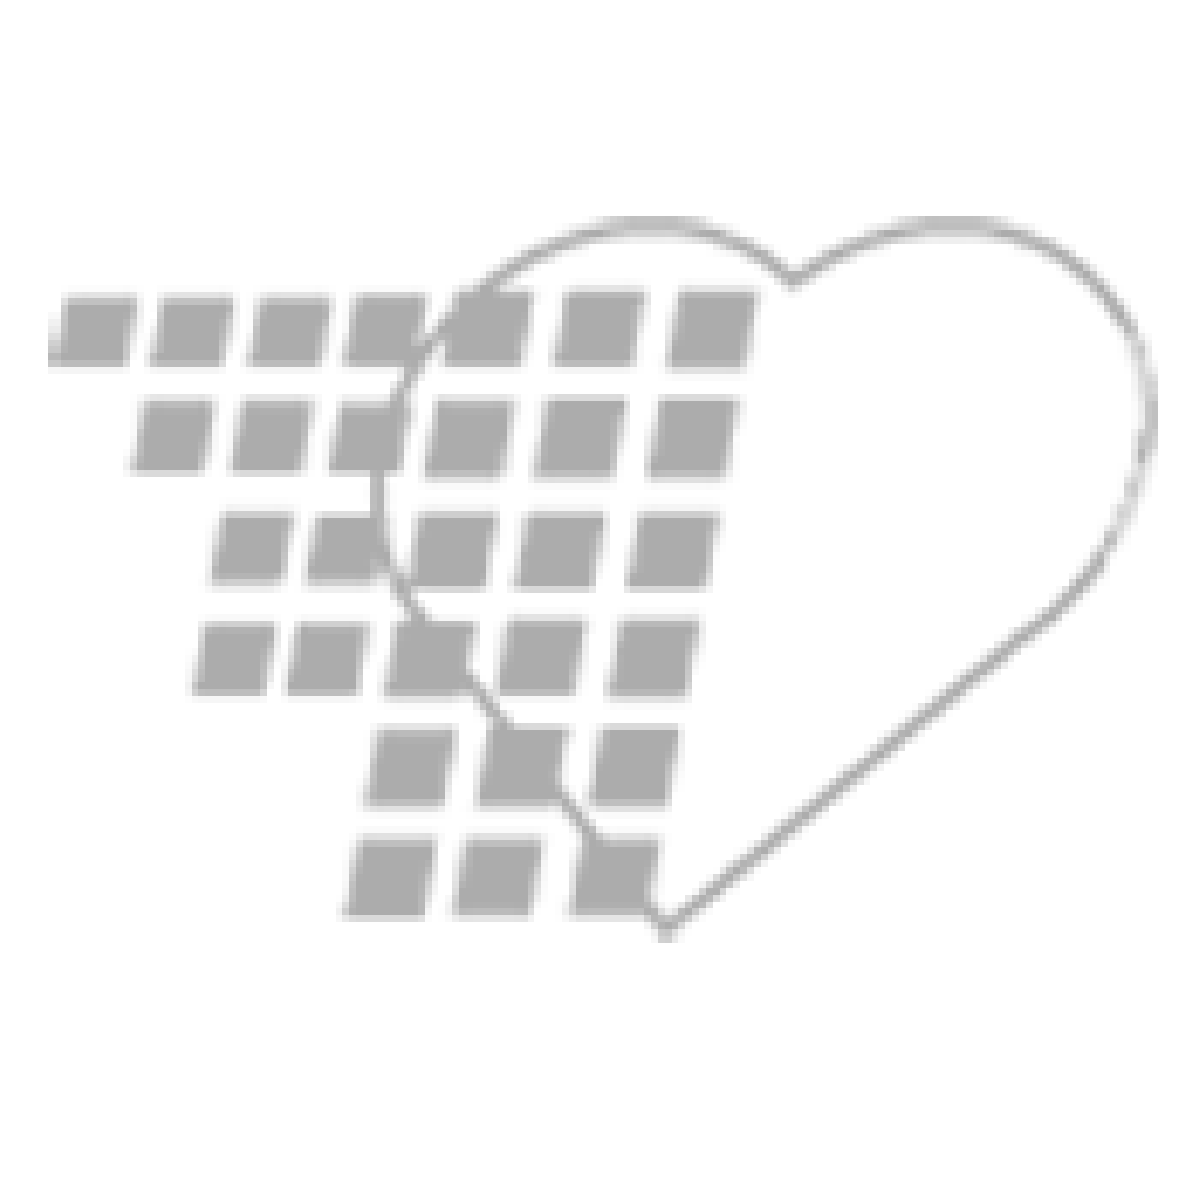 11-81-0112 Simulaids 12- Lead Arrhythmia Simulator with Manikin Overlay